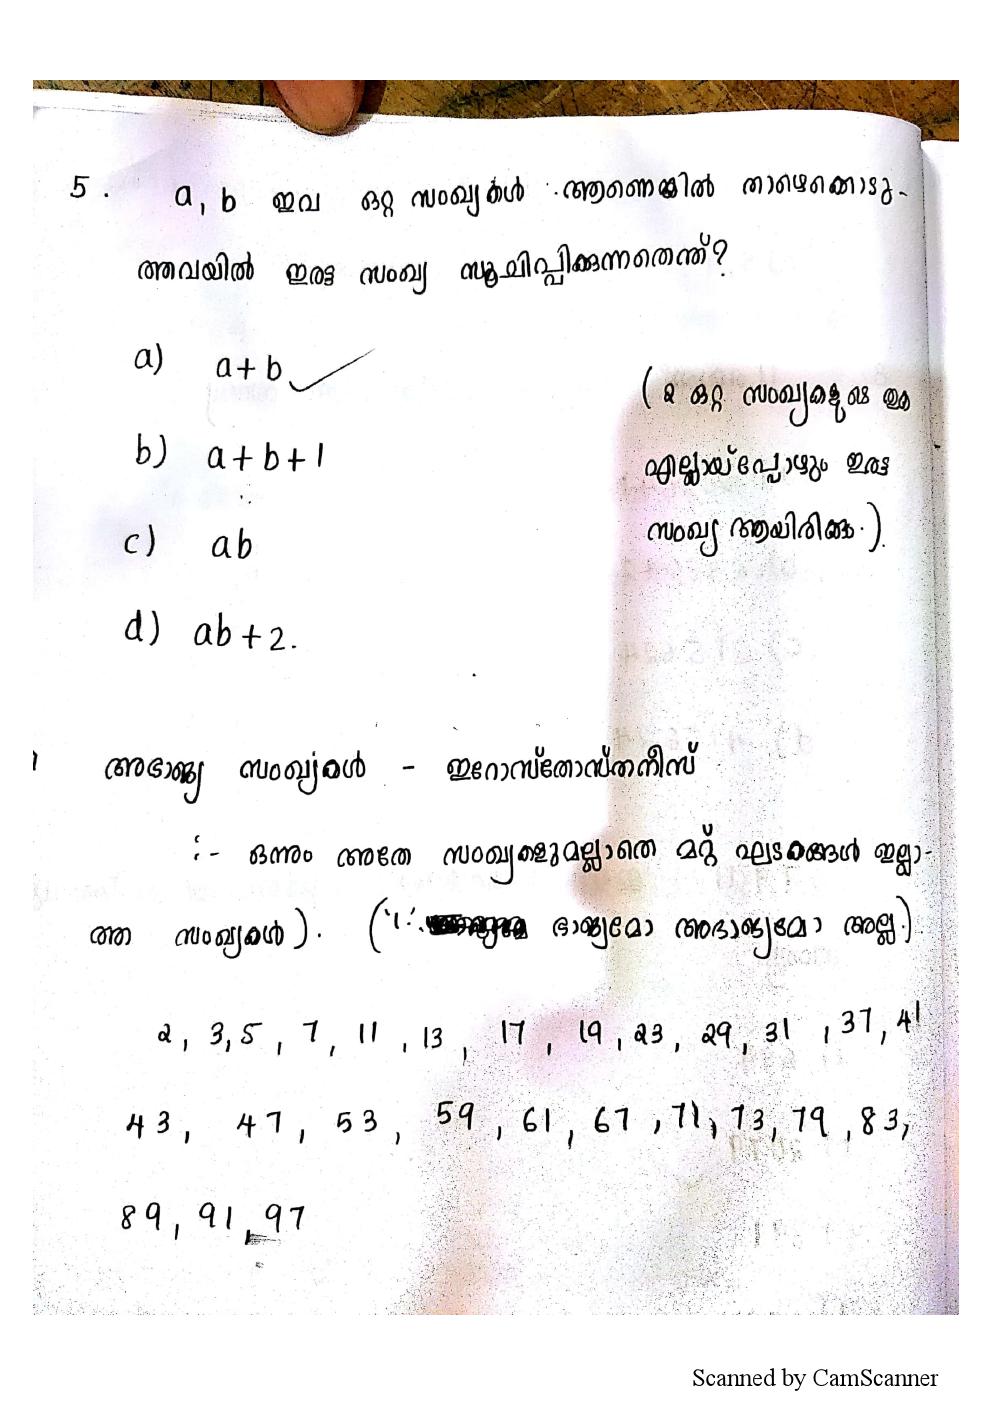 http://masterstudy.net/pdf/ktet_notes0017.png